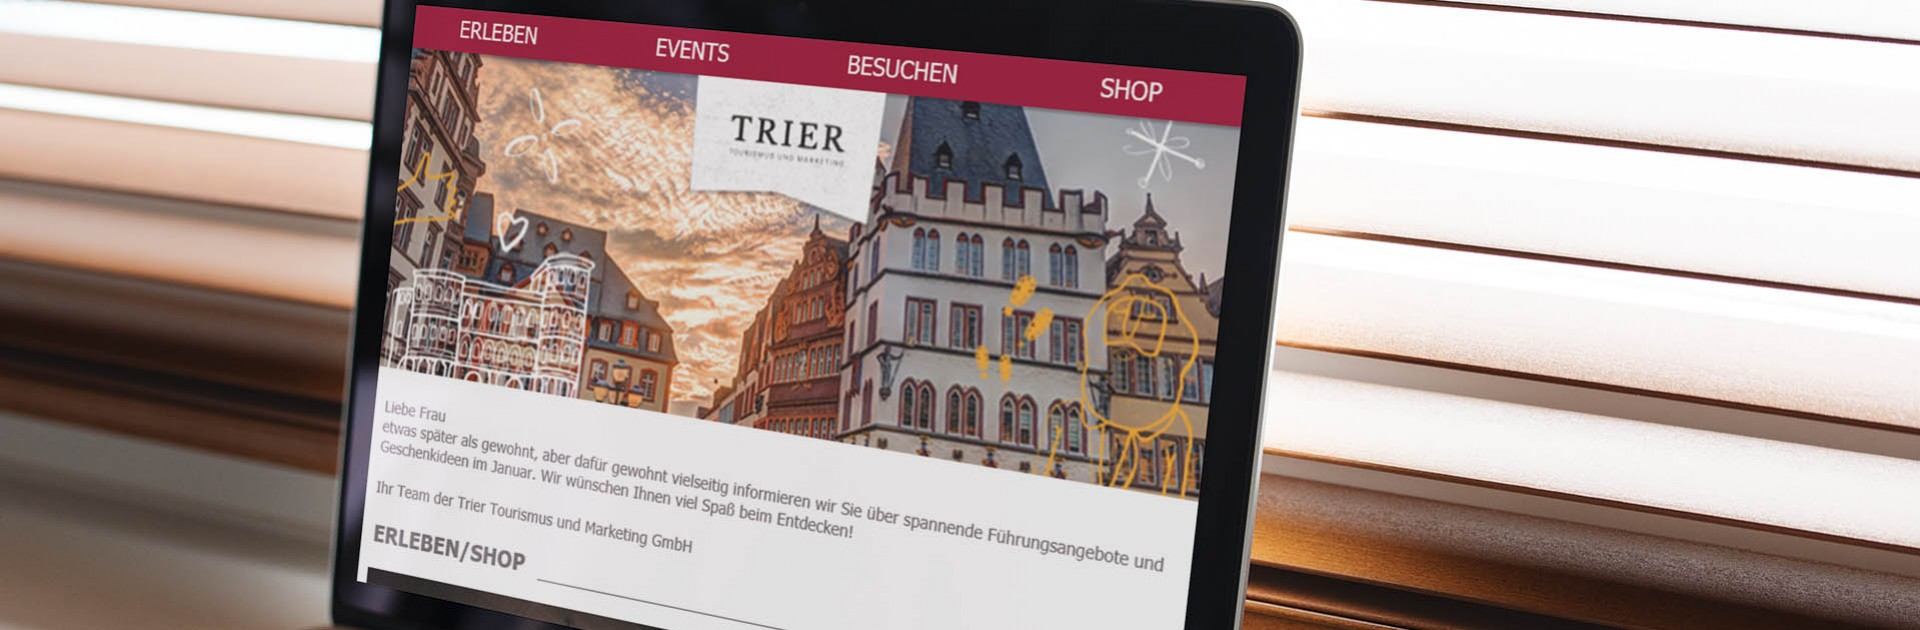 https://www.trier-info.de/cams/clients/ttm/media/newsletter_headerBild_1.jpg